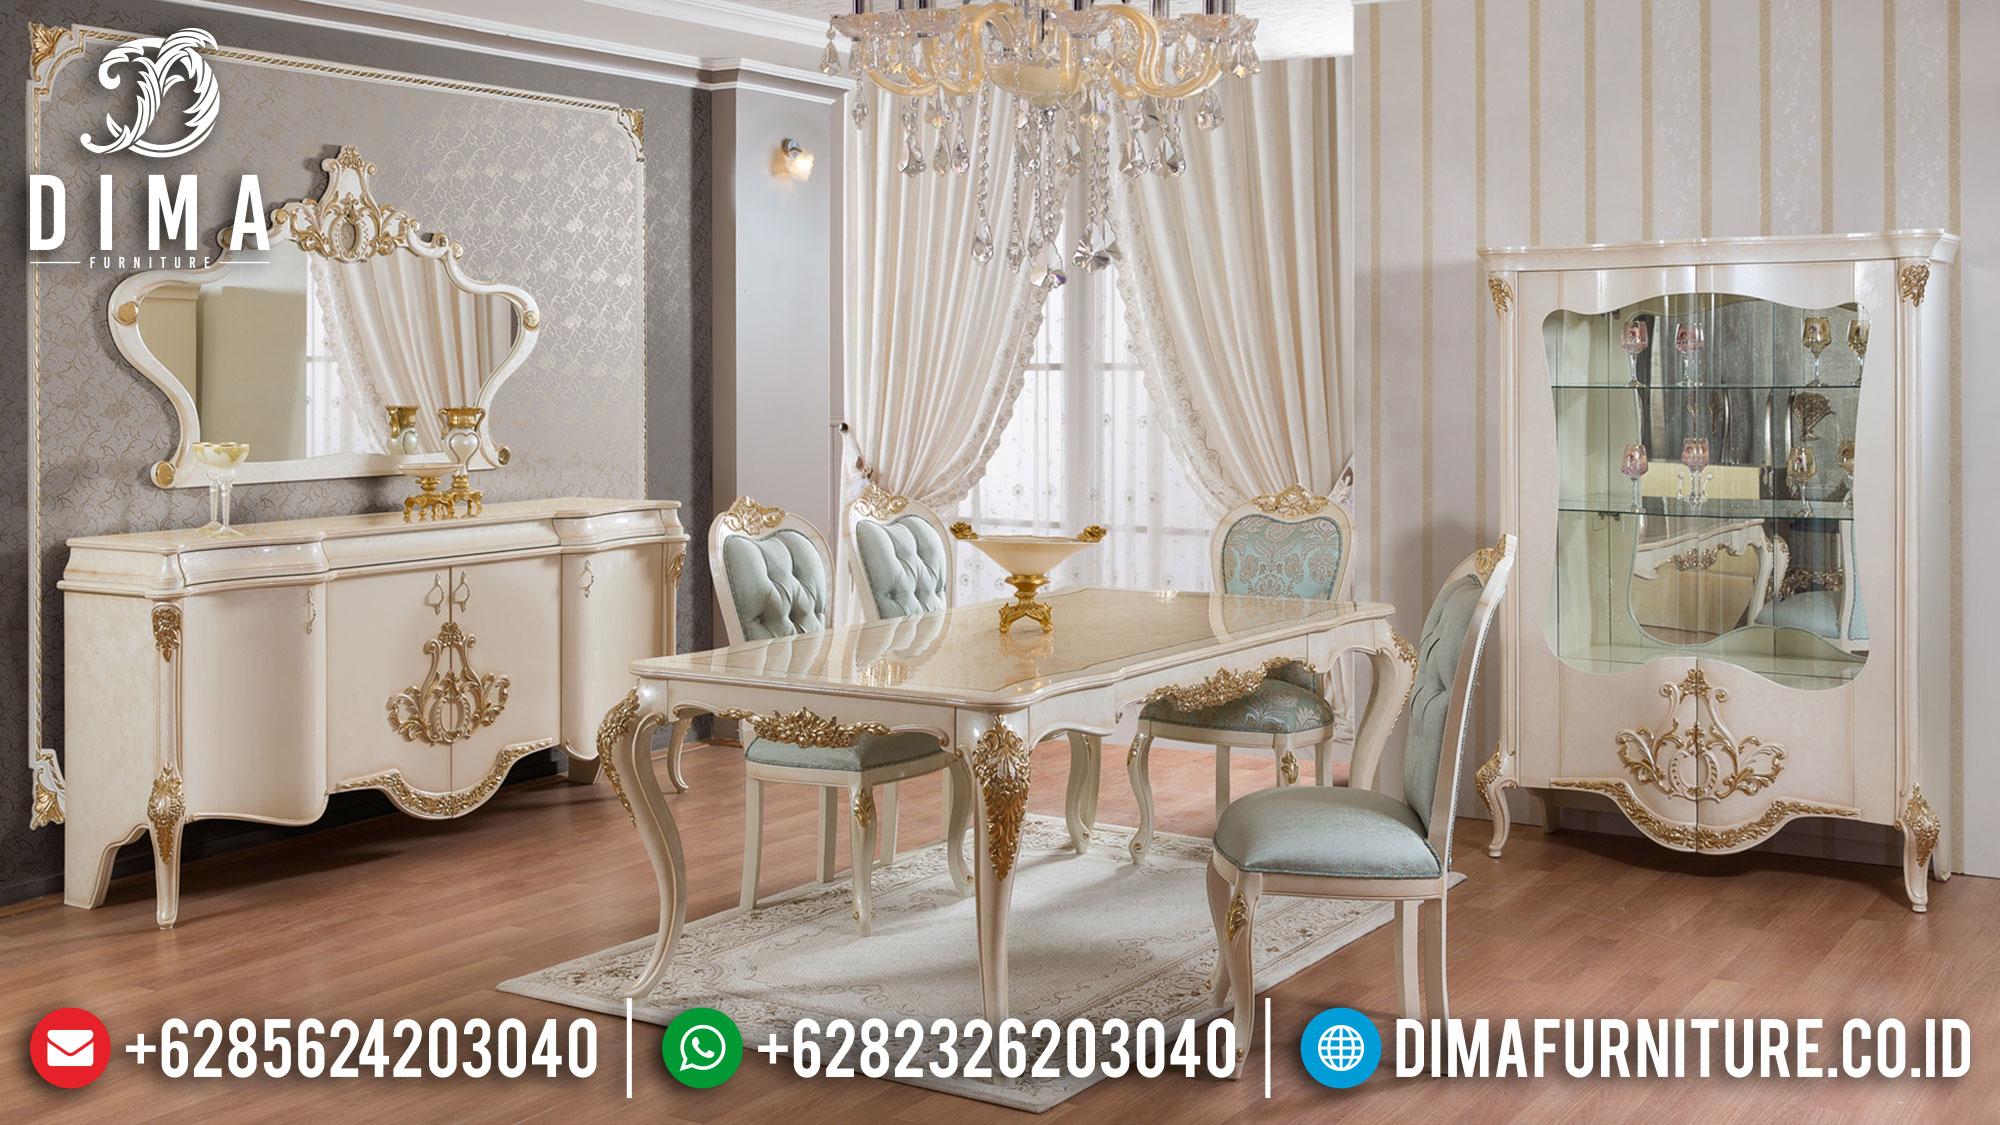 Beautiful Set Meja Makan Mewah Luxury Elegant Style Terbaru TTJ-1376